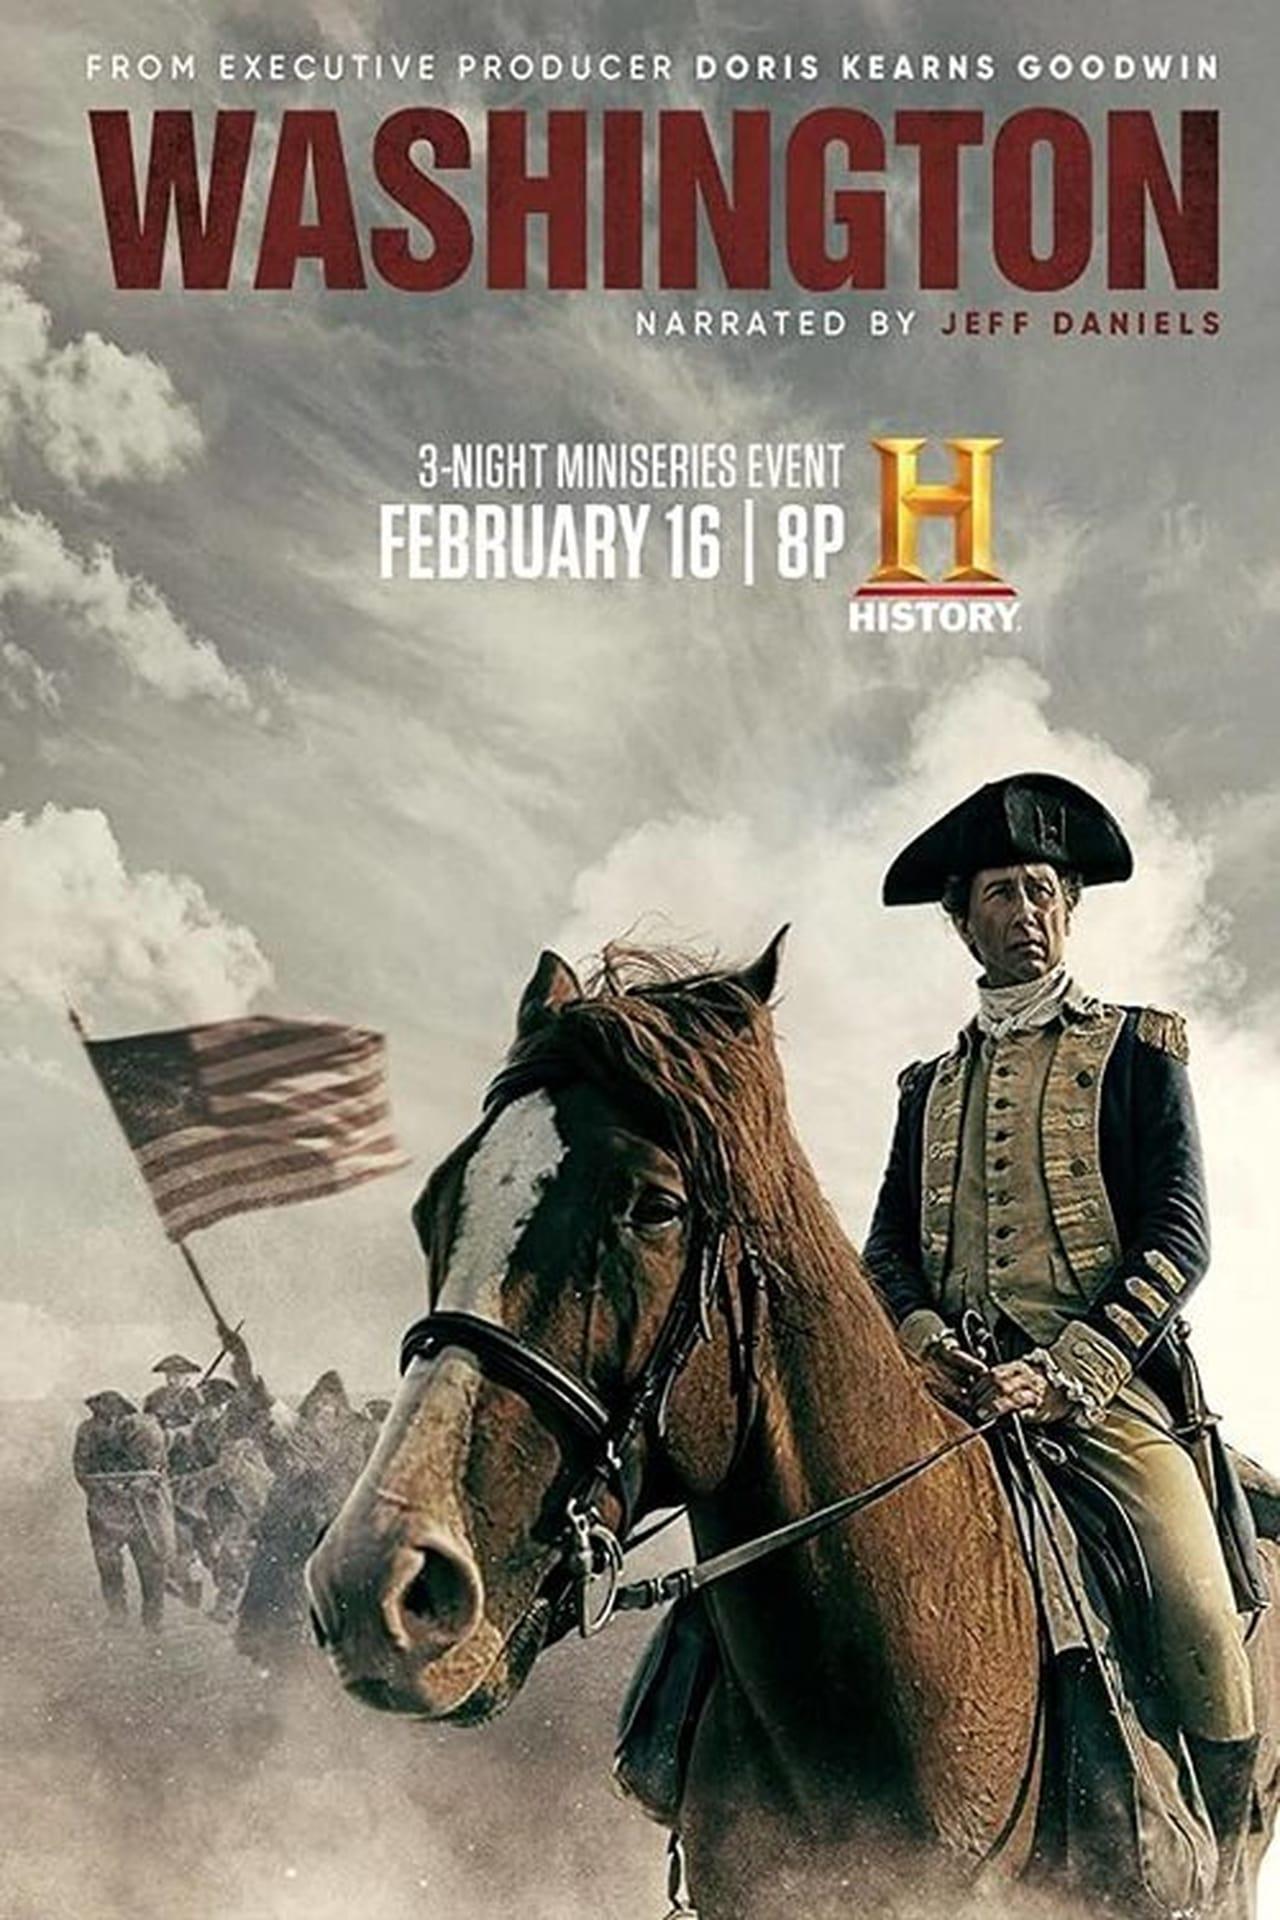 Serie Washington Season 1 on Soap2day online